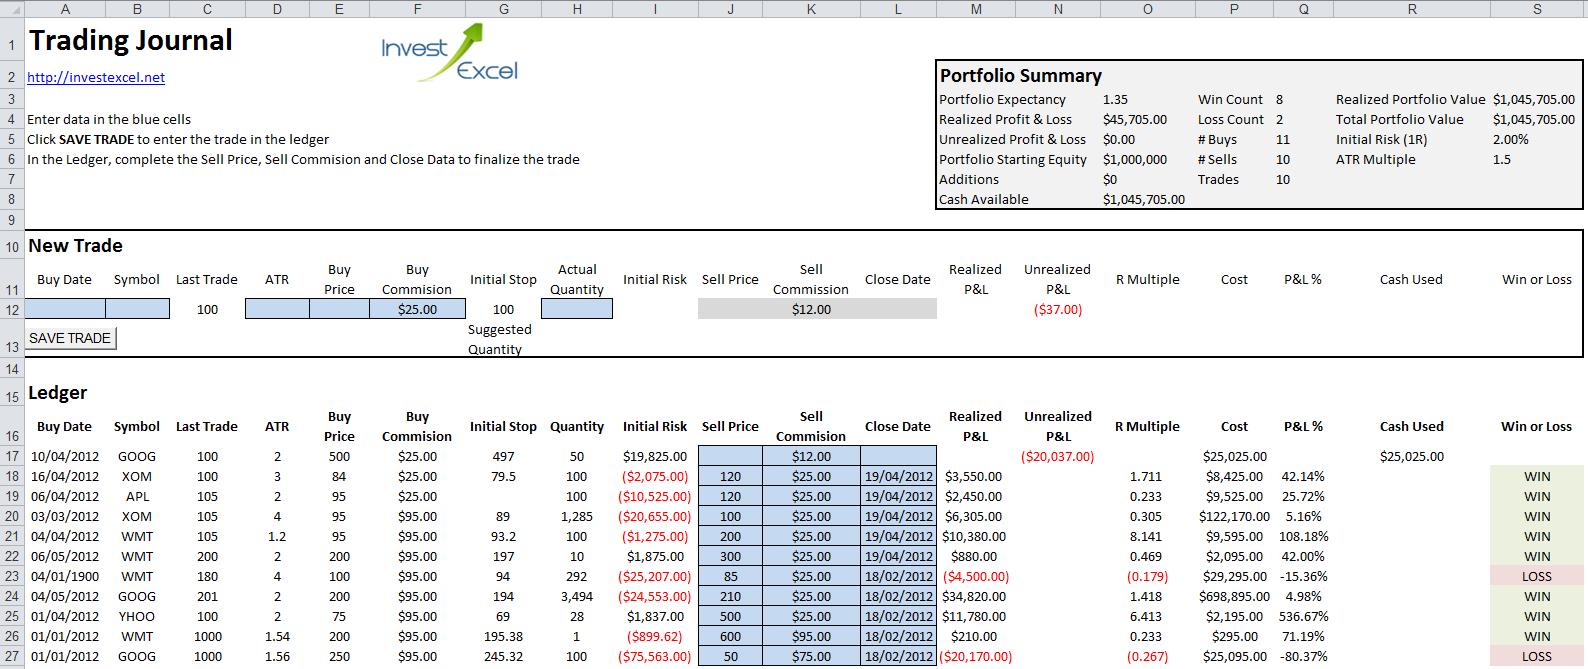 Trading Spreadsheet For Options Trading Excel Spreadsheet  News  Fountain Gate Cinemas